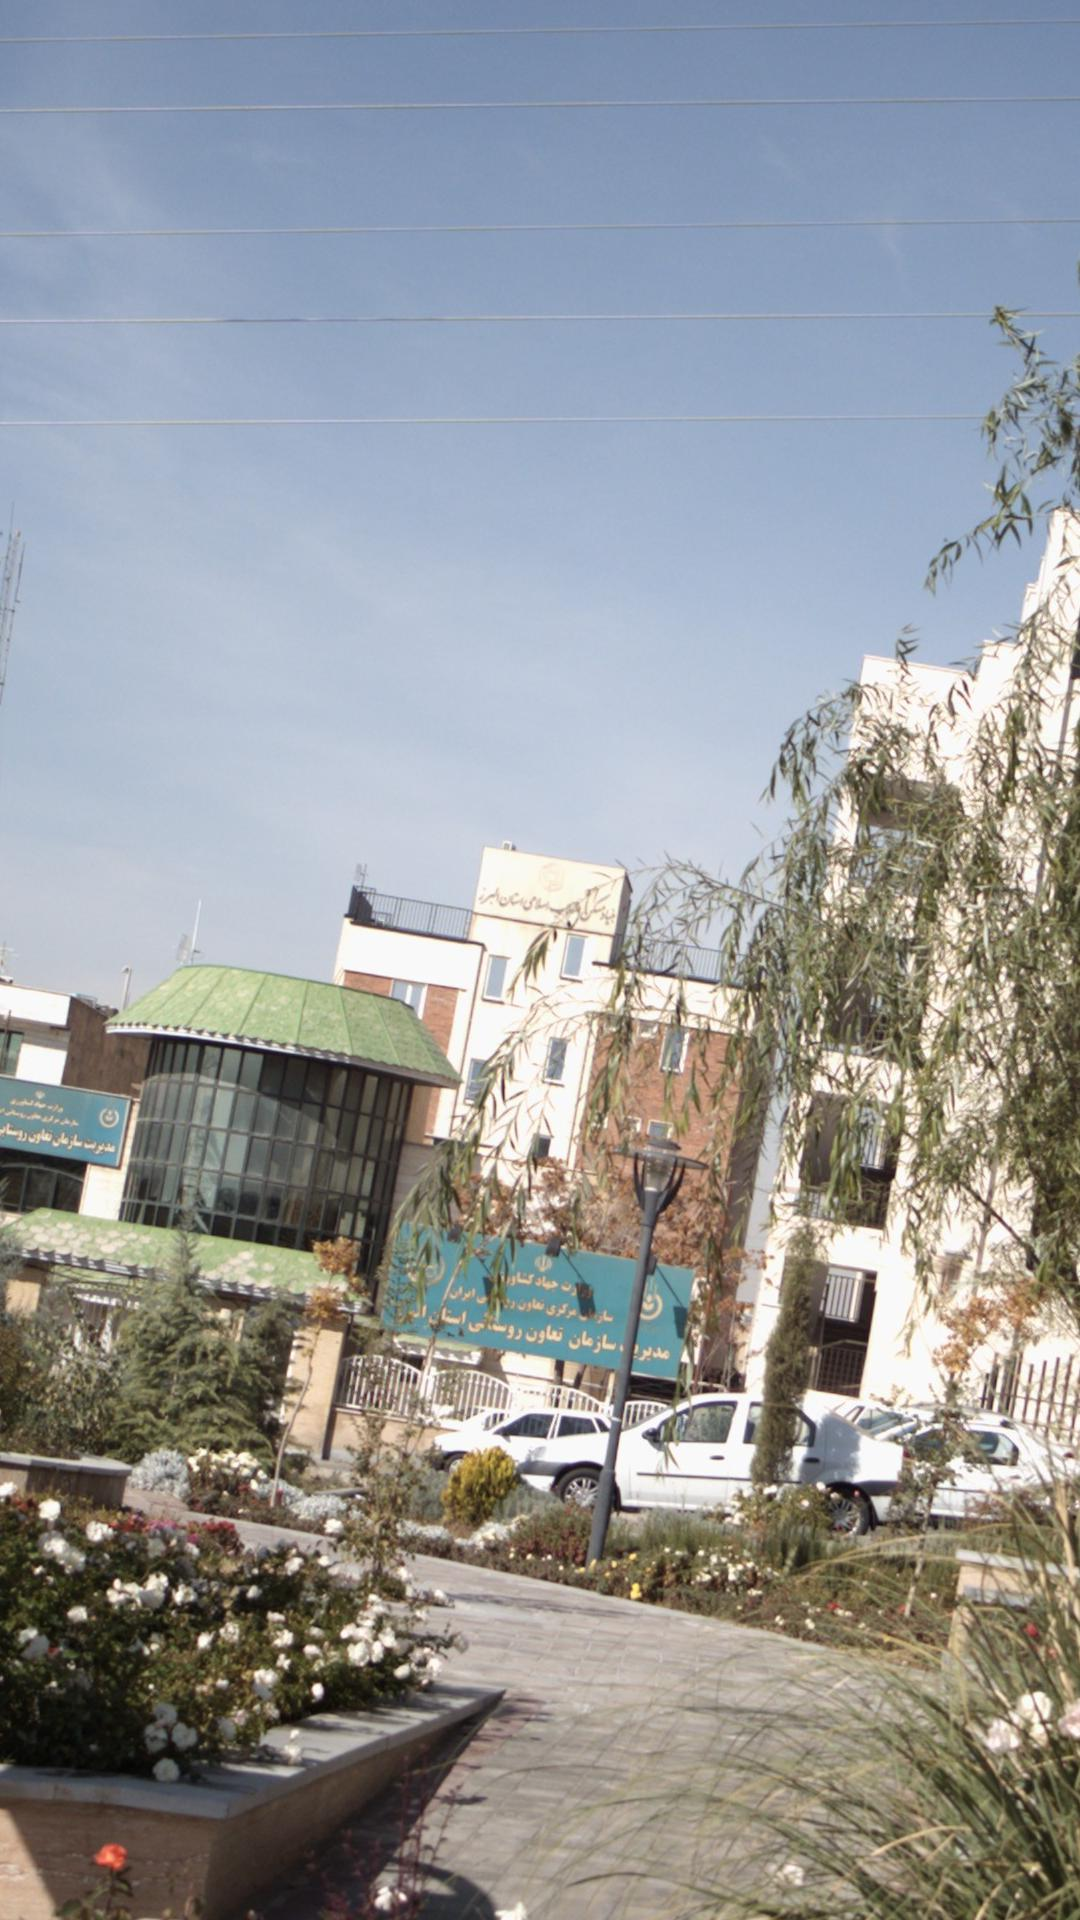 بنیاد مسکن انقلاب اسلامی استان البرز